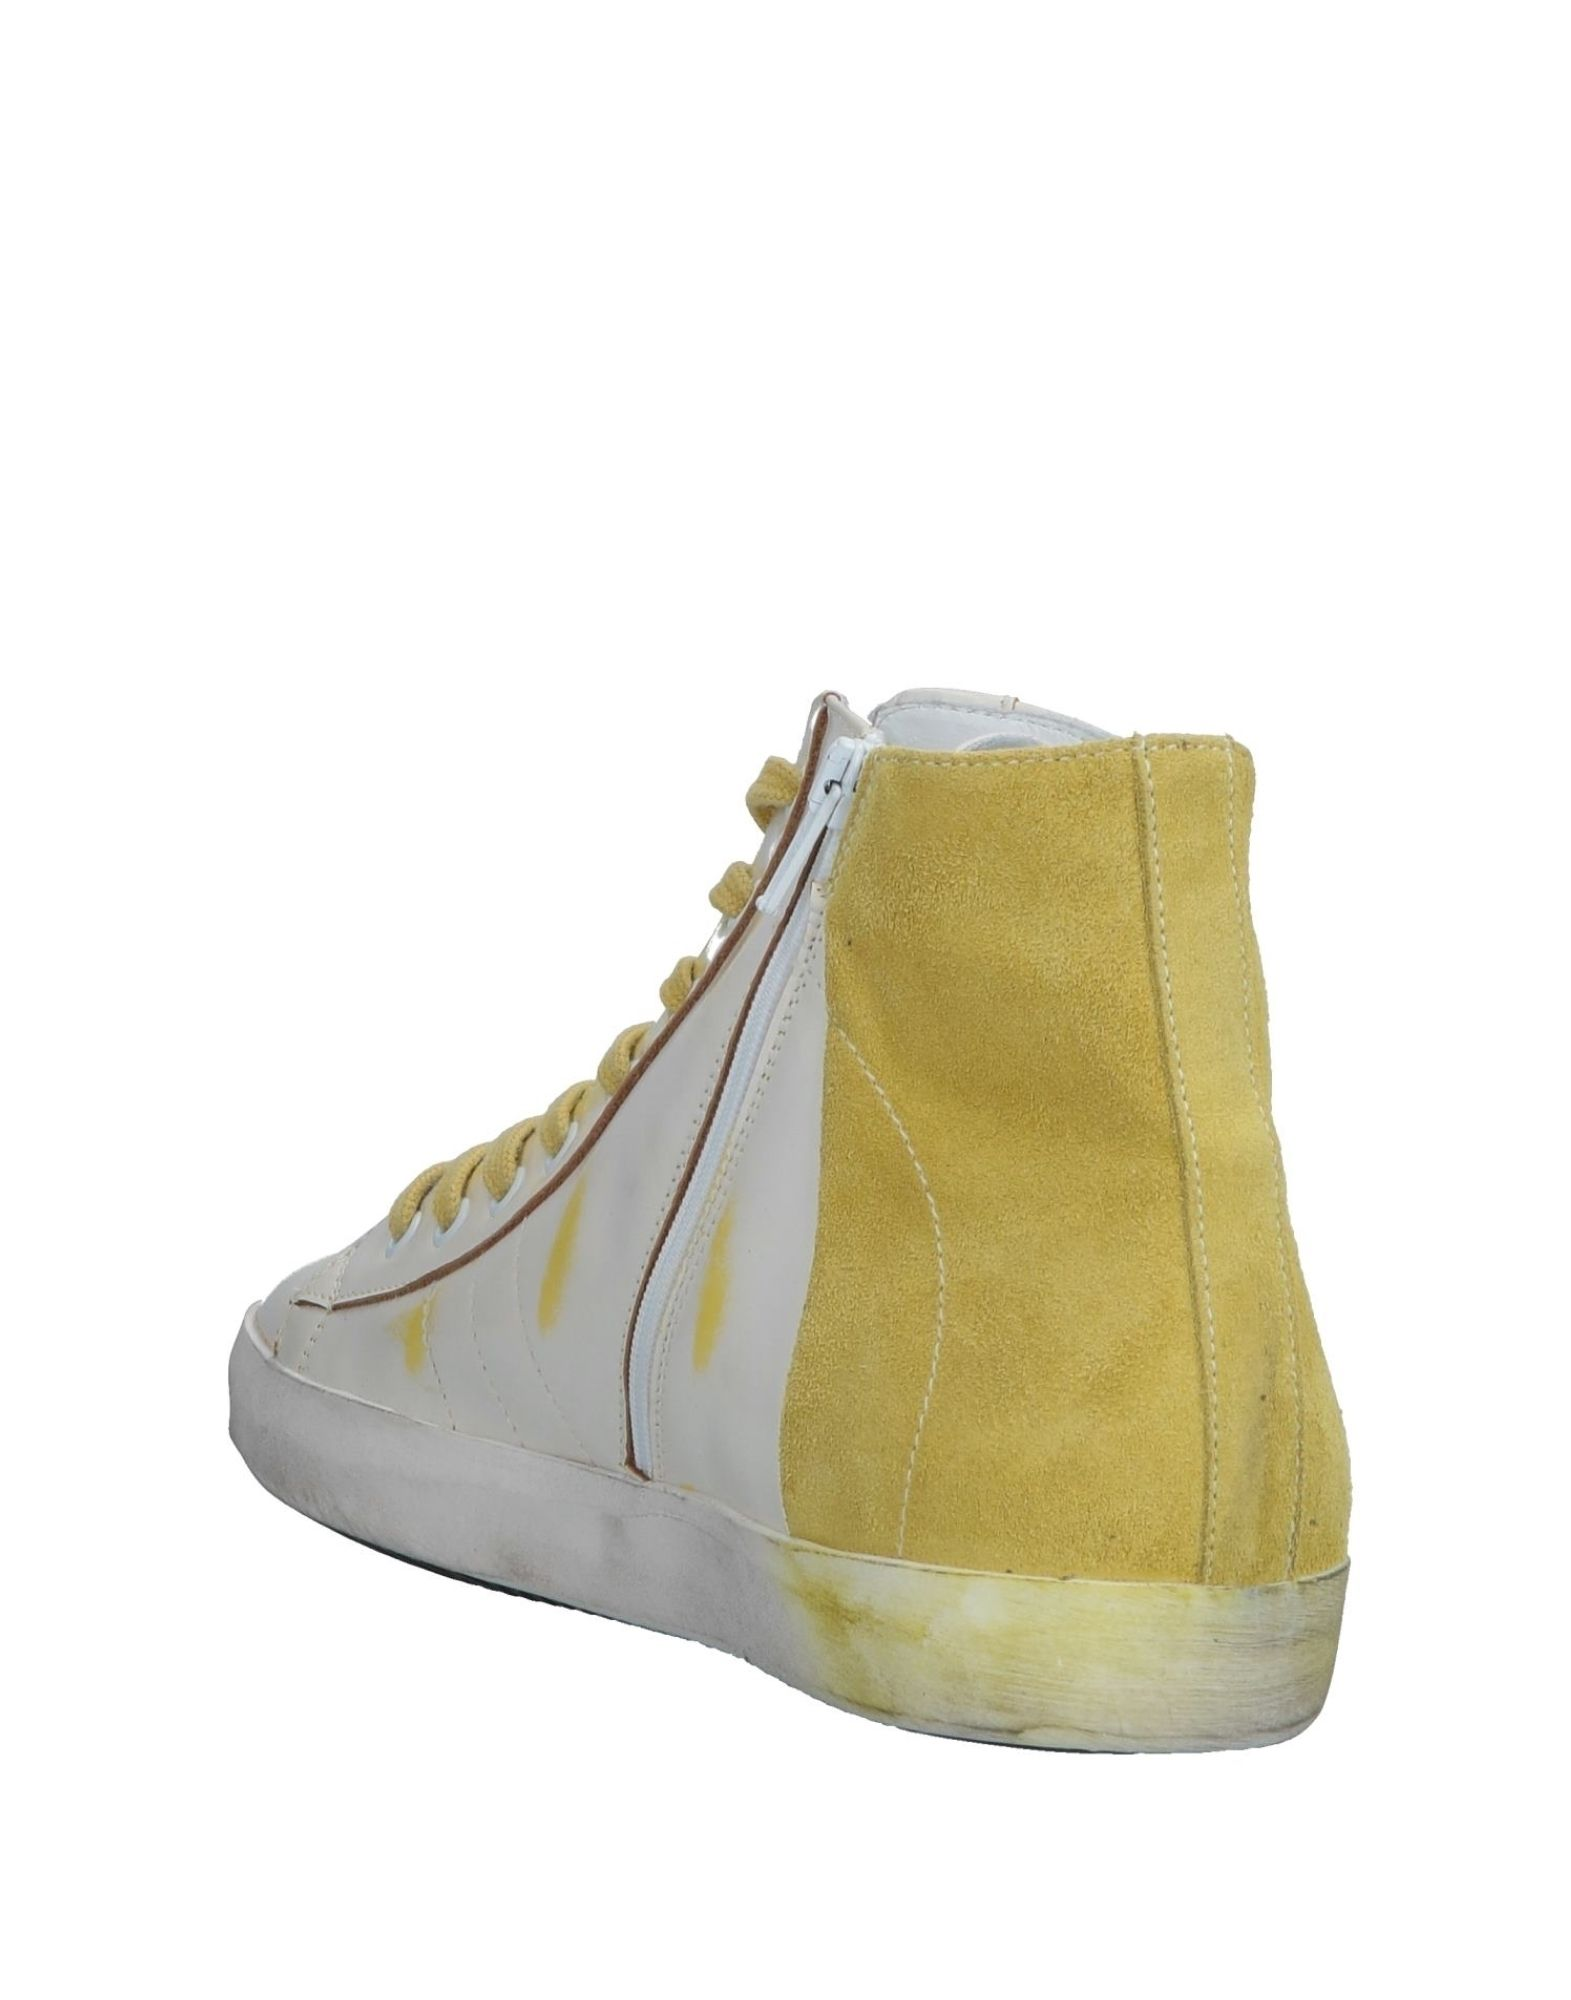 Primabase Sneakers - Men Primabase Sneakers Sneakers Sneakers online on  Australia - 11579849HC 73f16f